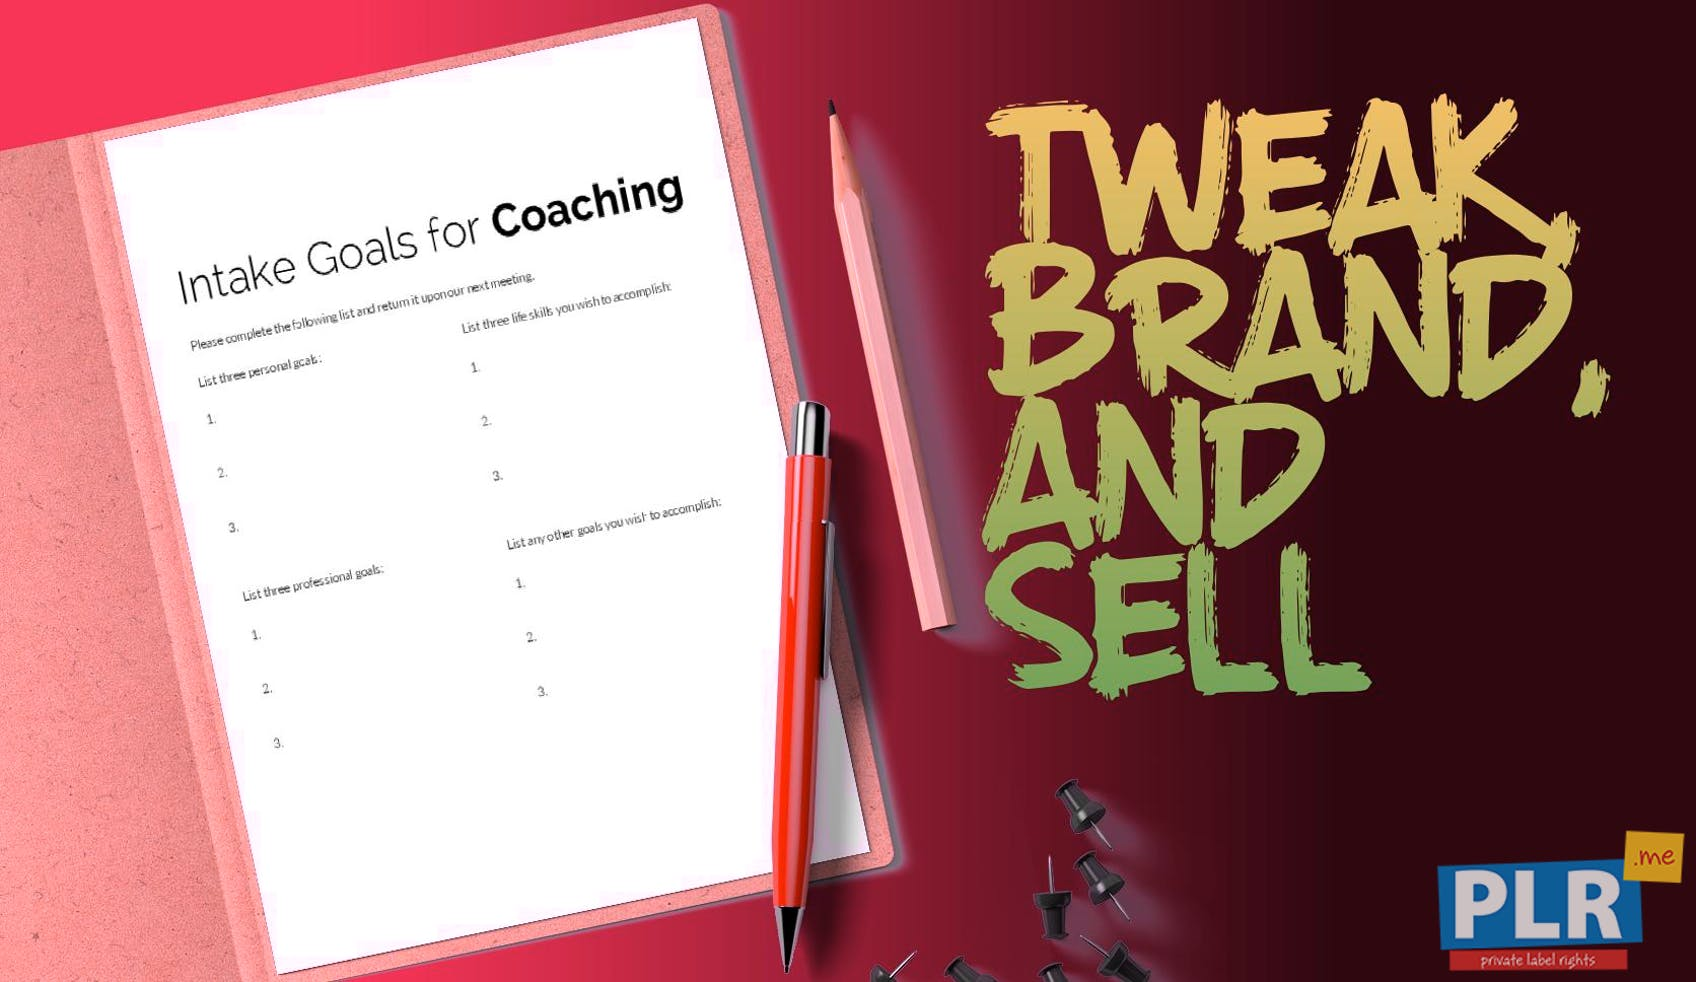 Intake Goals For Coaching